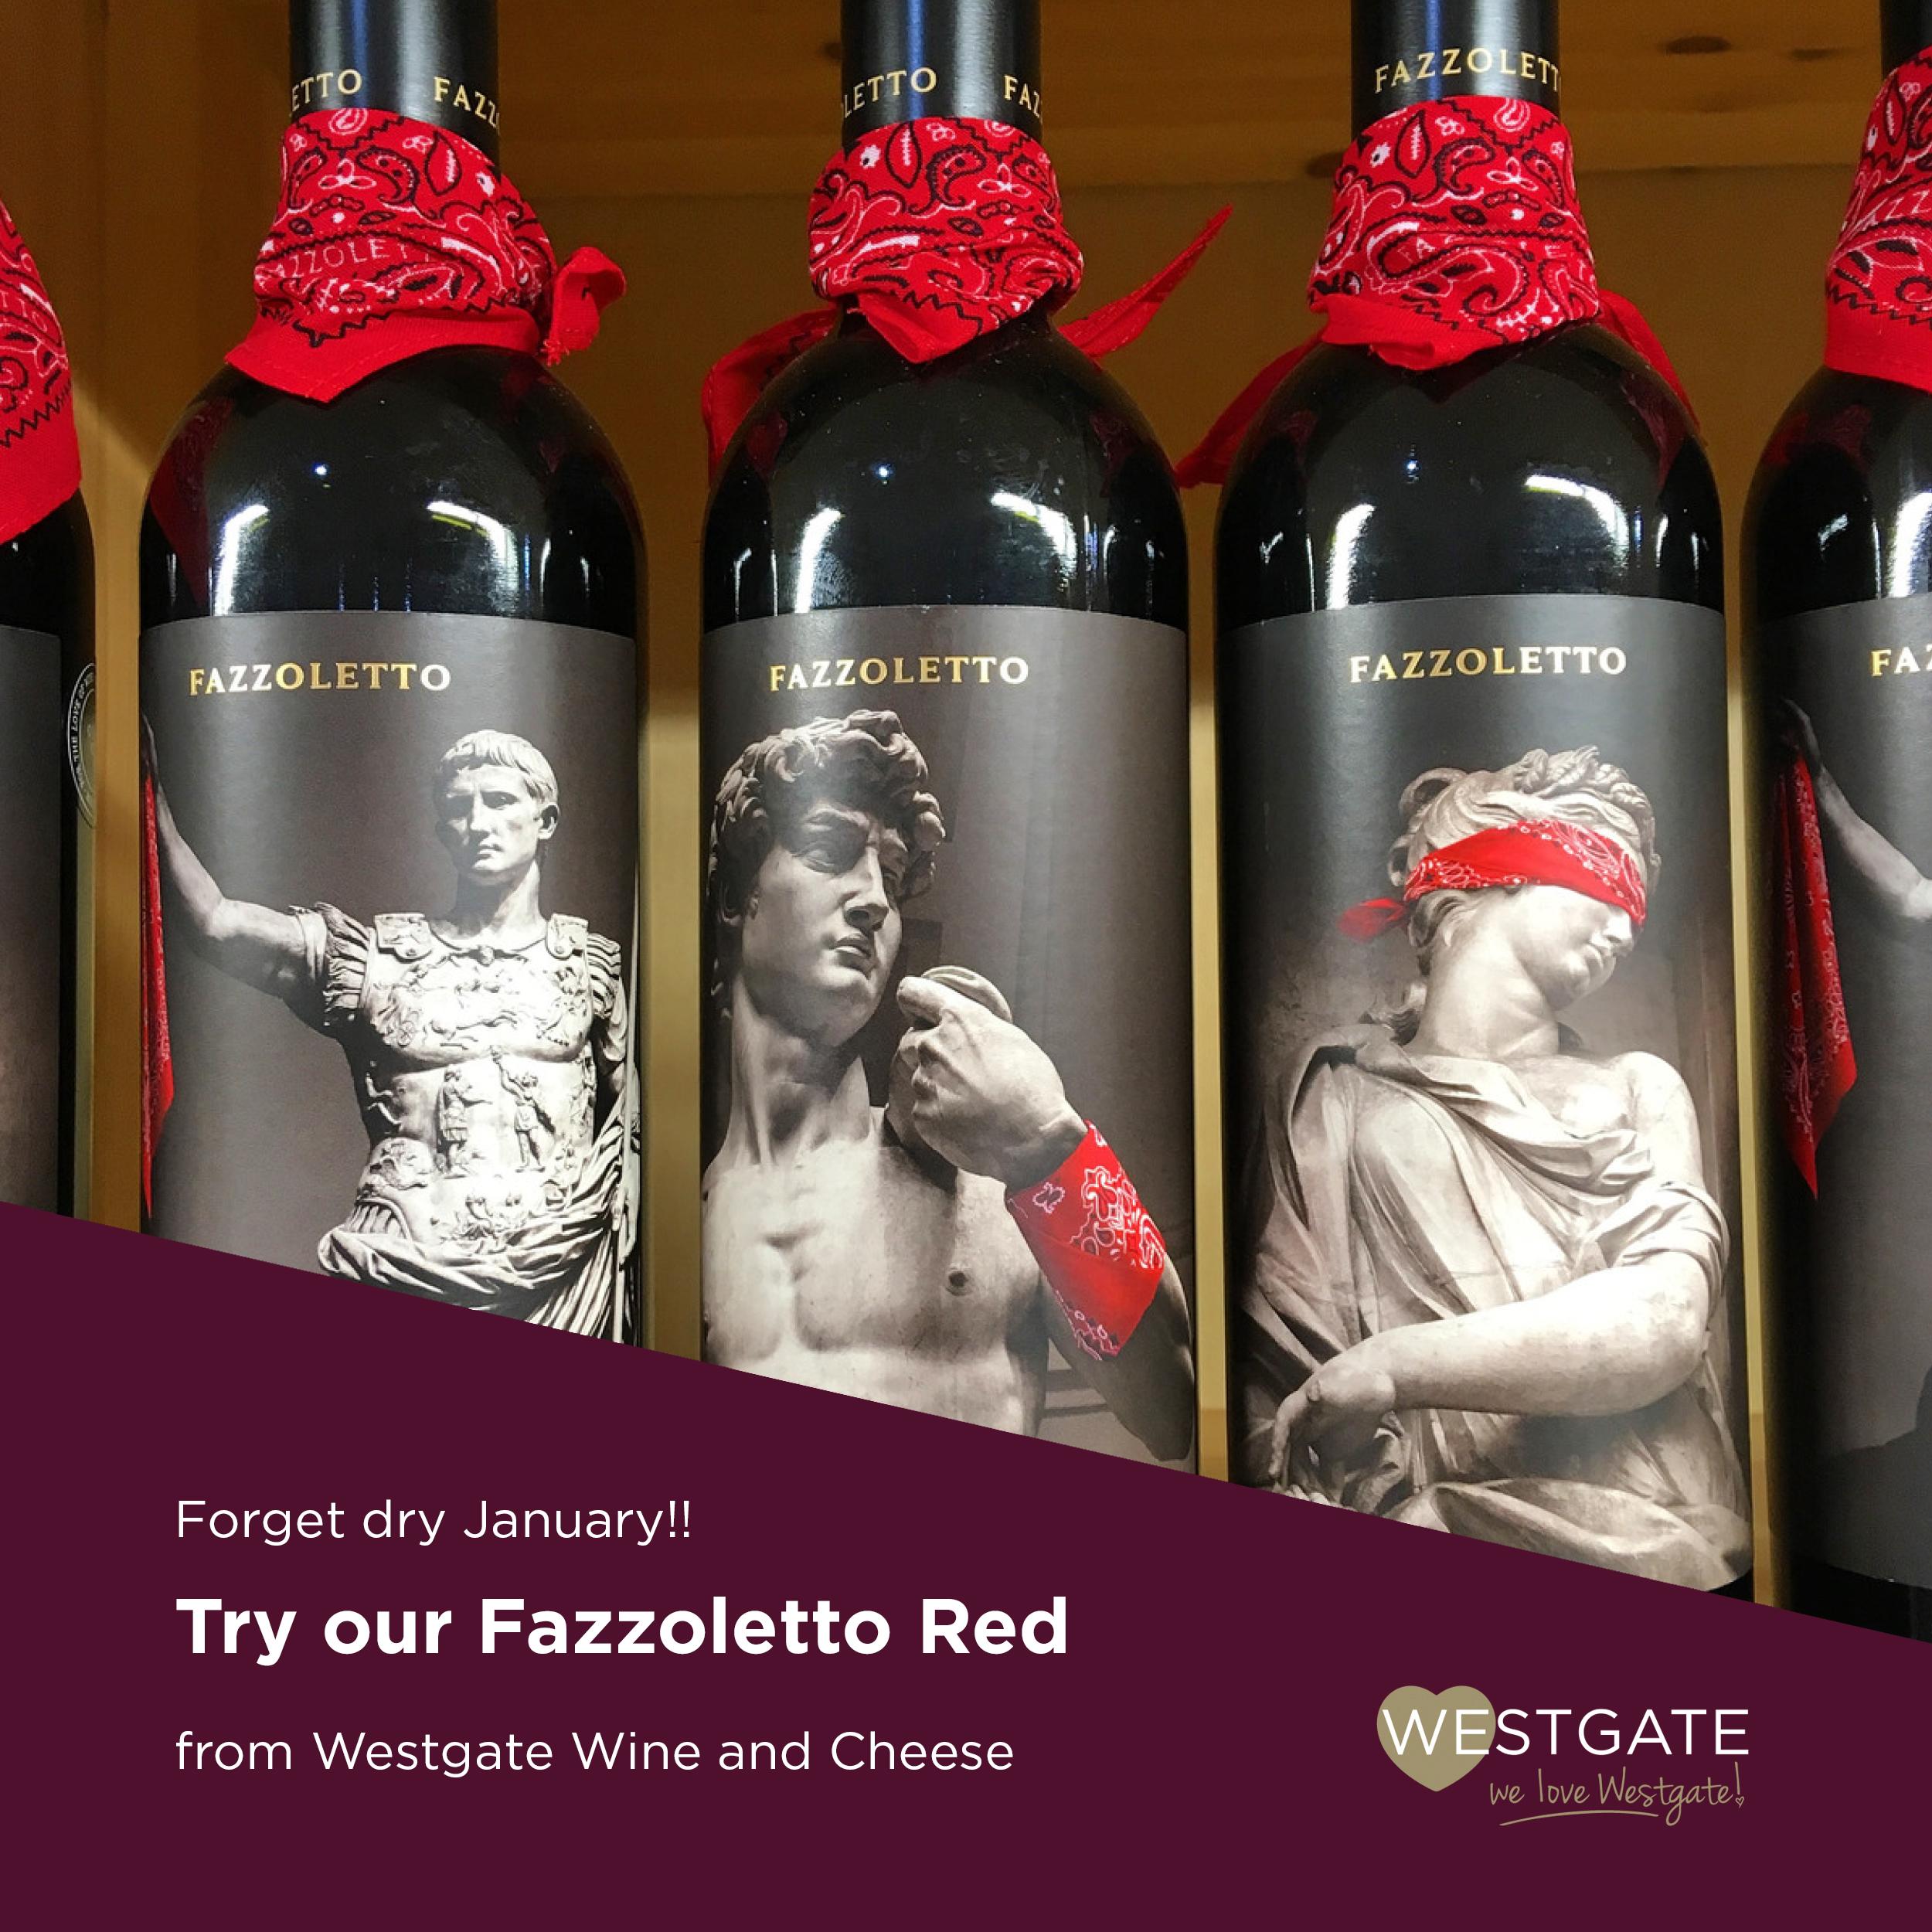 Fazzorreto wine.jpg